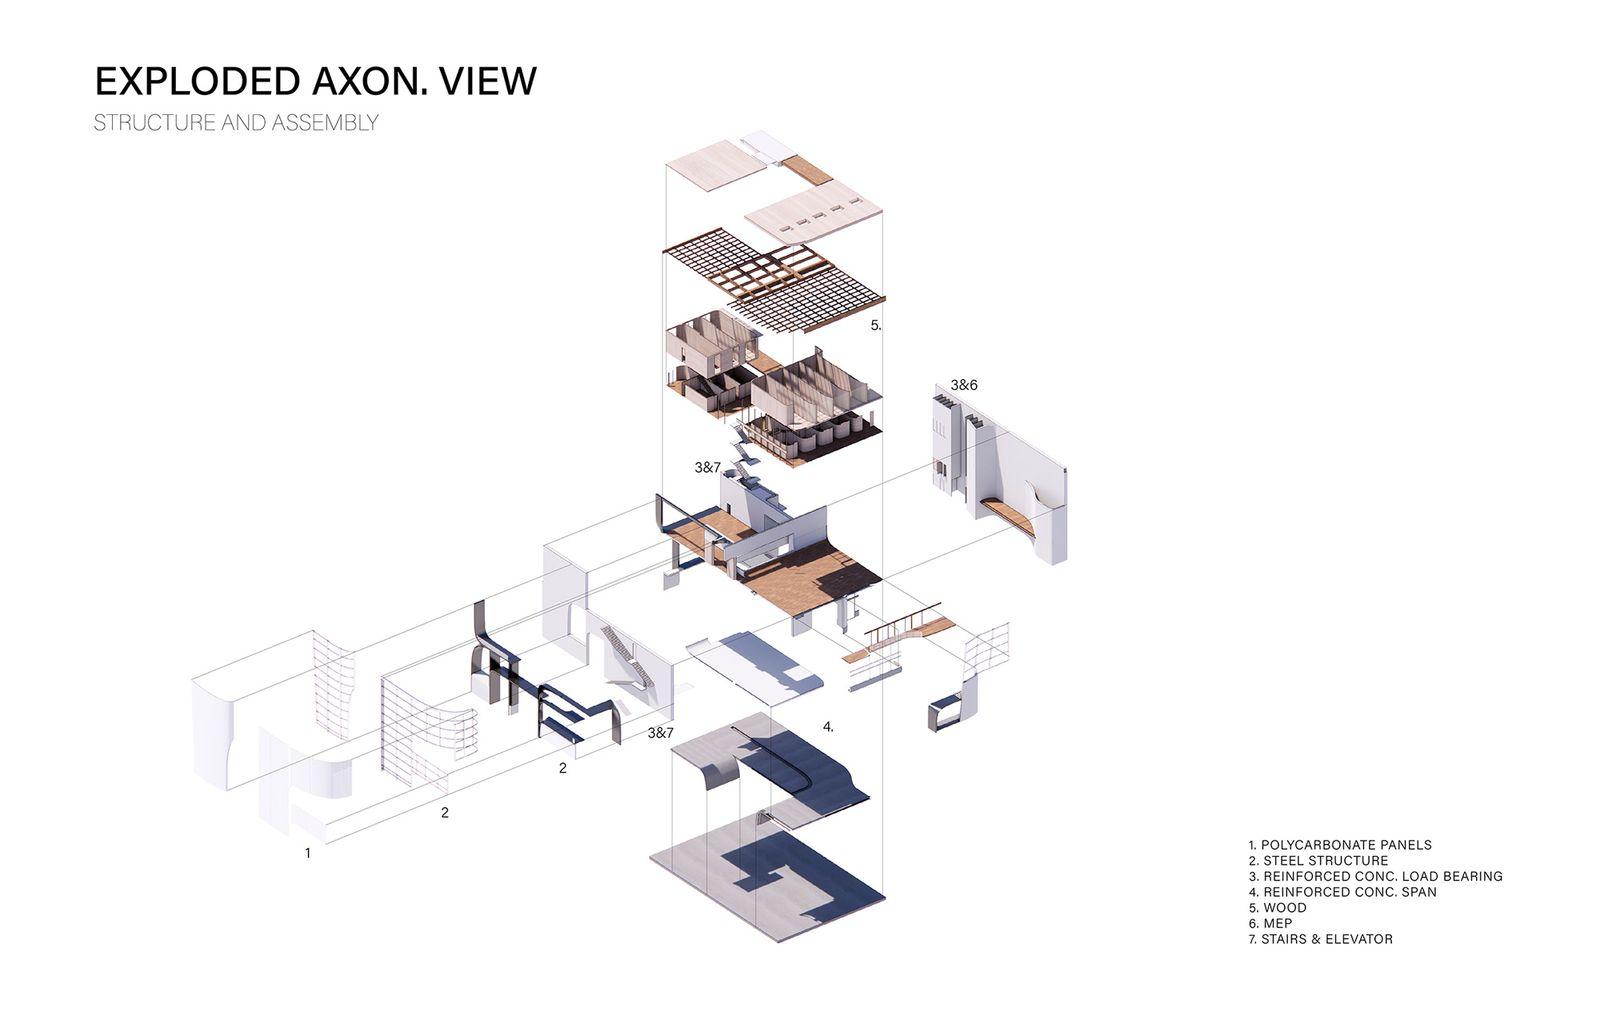 Exploded Axon Diagram